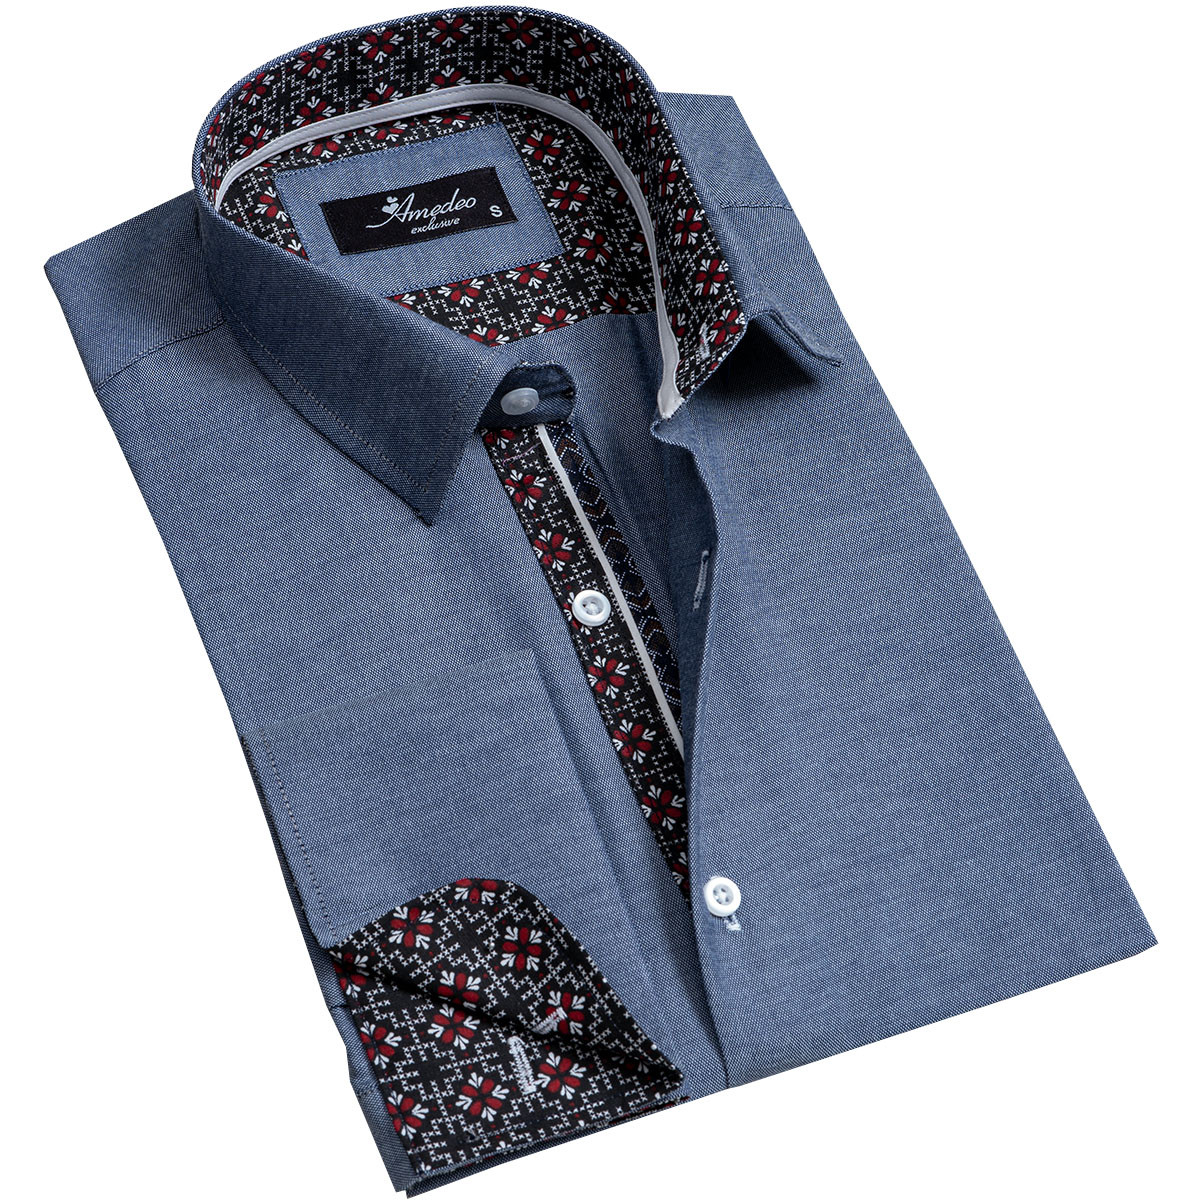 European Made & Designed Reversible Cuff Premium French Cuff Dress Shirt - denim blue